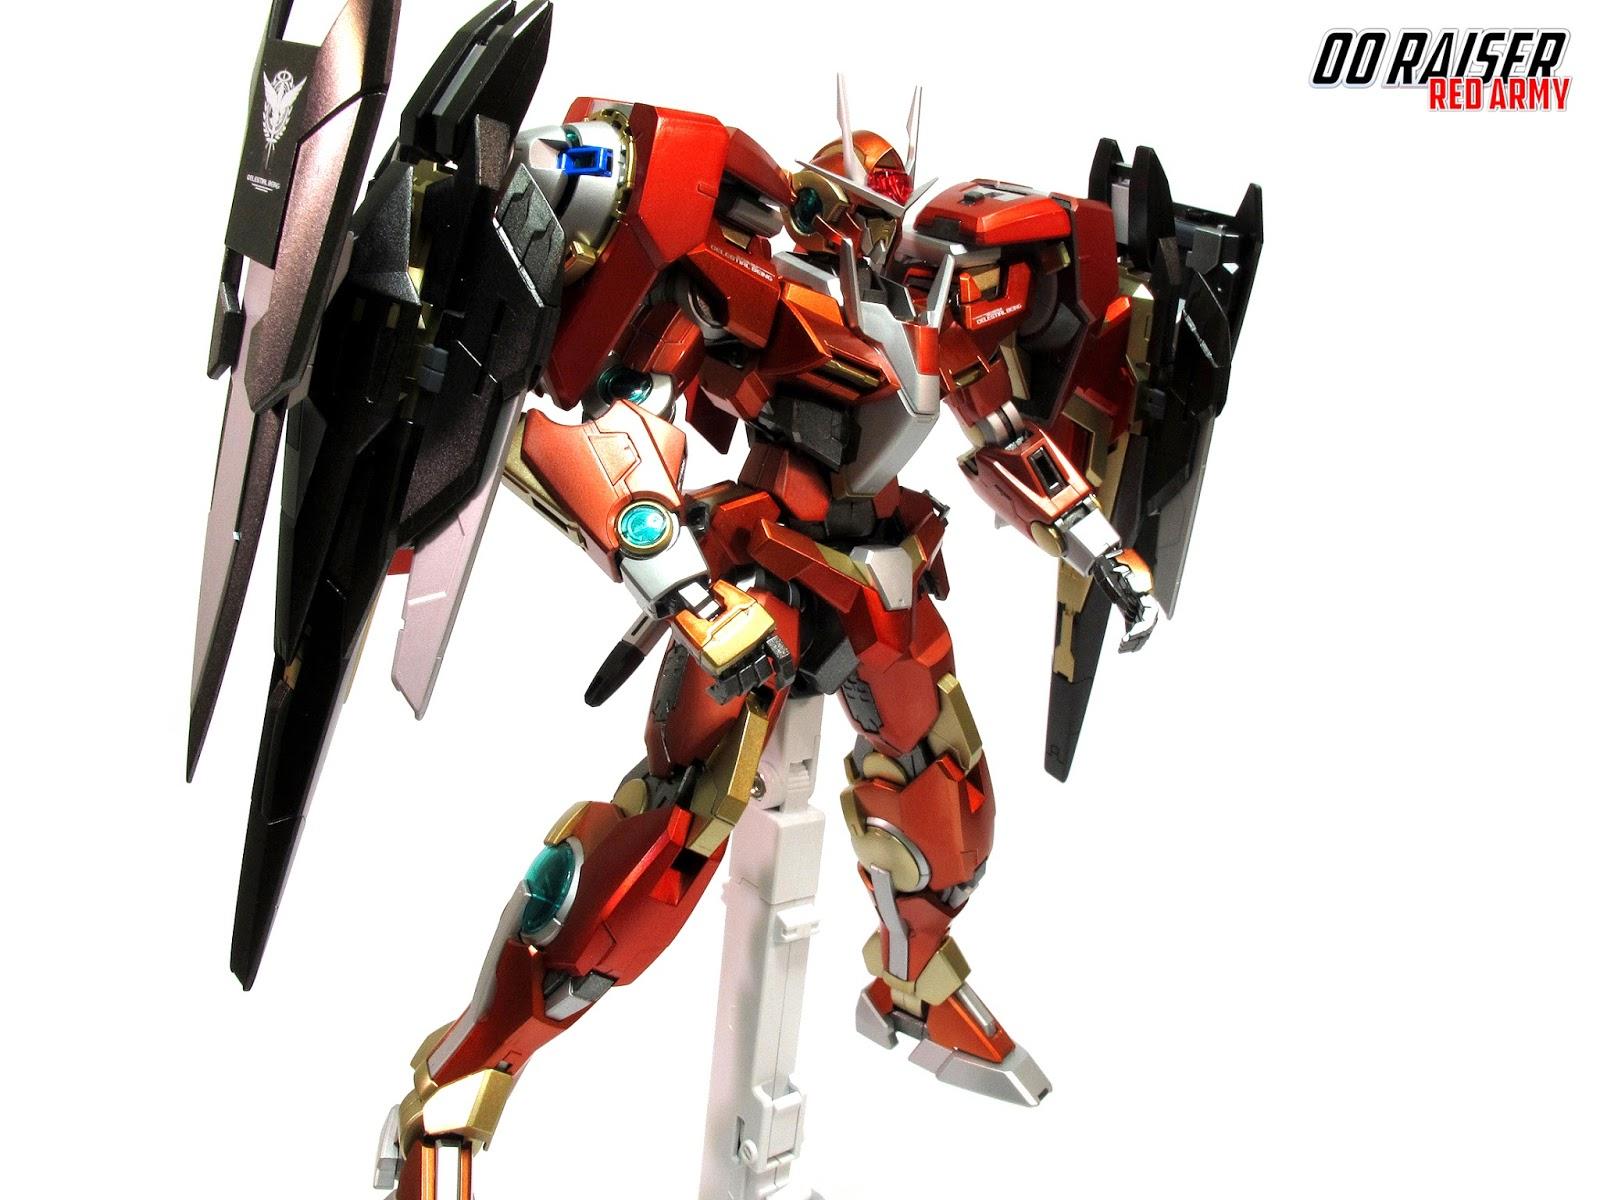 Red Army] Gundam 1 100 MG [Red Army] 00 Raiser